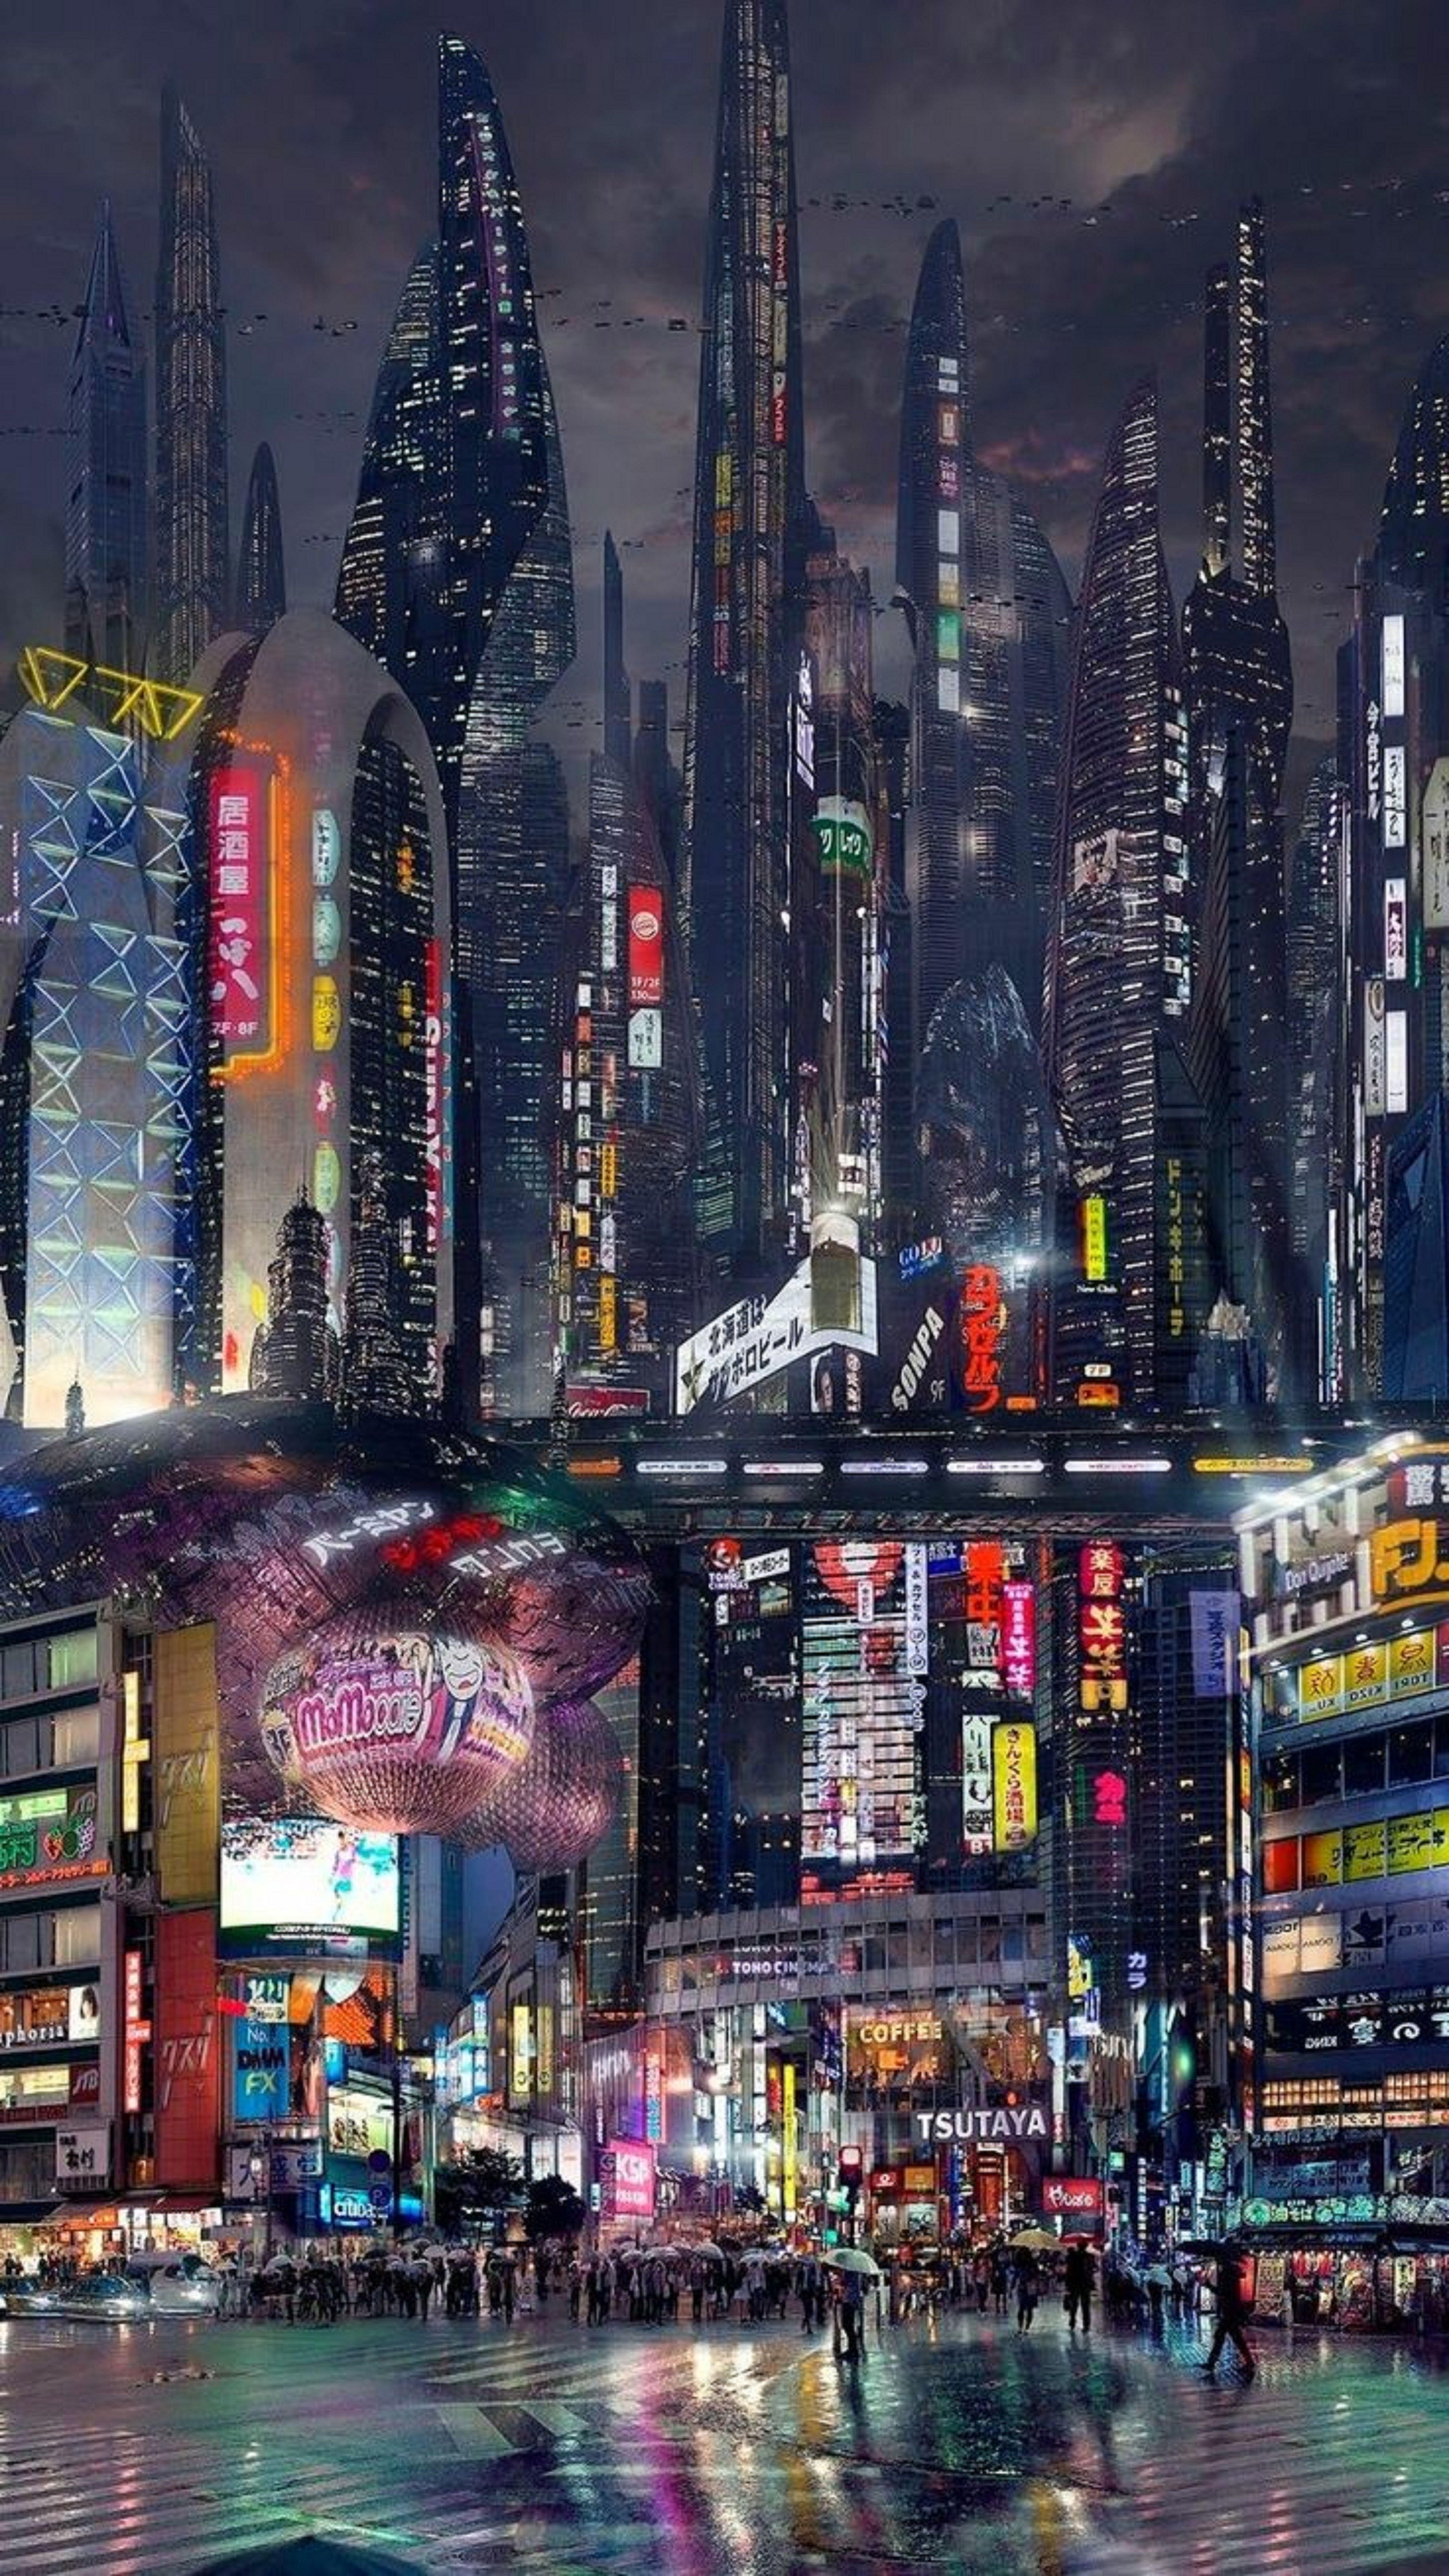 Abstract Design 33 Case Skin For Samsung Galaxy Cyberpunk City Sci Fi City Futuristic Art